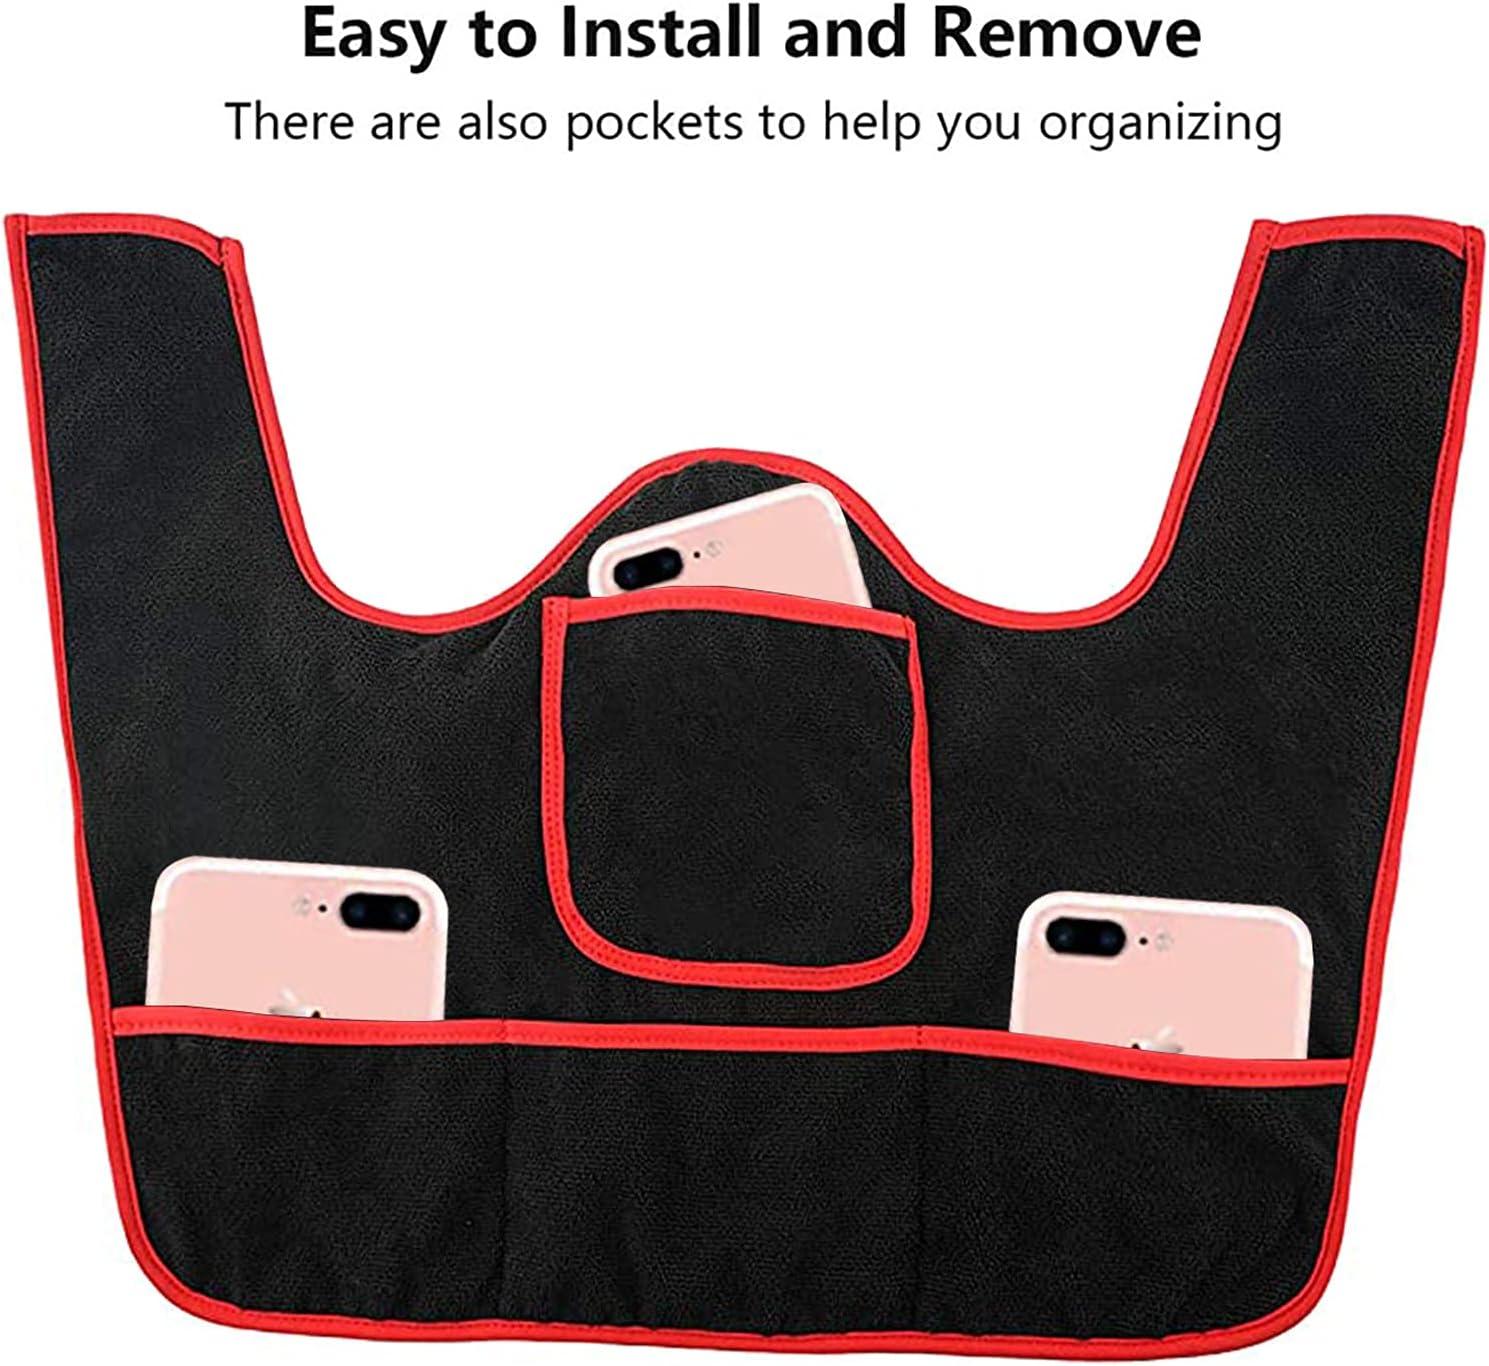 Sports Fitness Bike Dust Cover Spintowel for Peloton Bike JTY Anti-Slippery Handlebar Sweat Towel Sweat Protection Towel Accessories for Peloton Bike Quick-Drying Neoprene Material